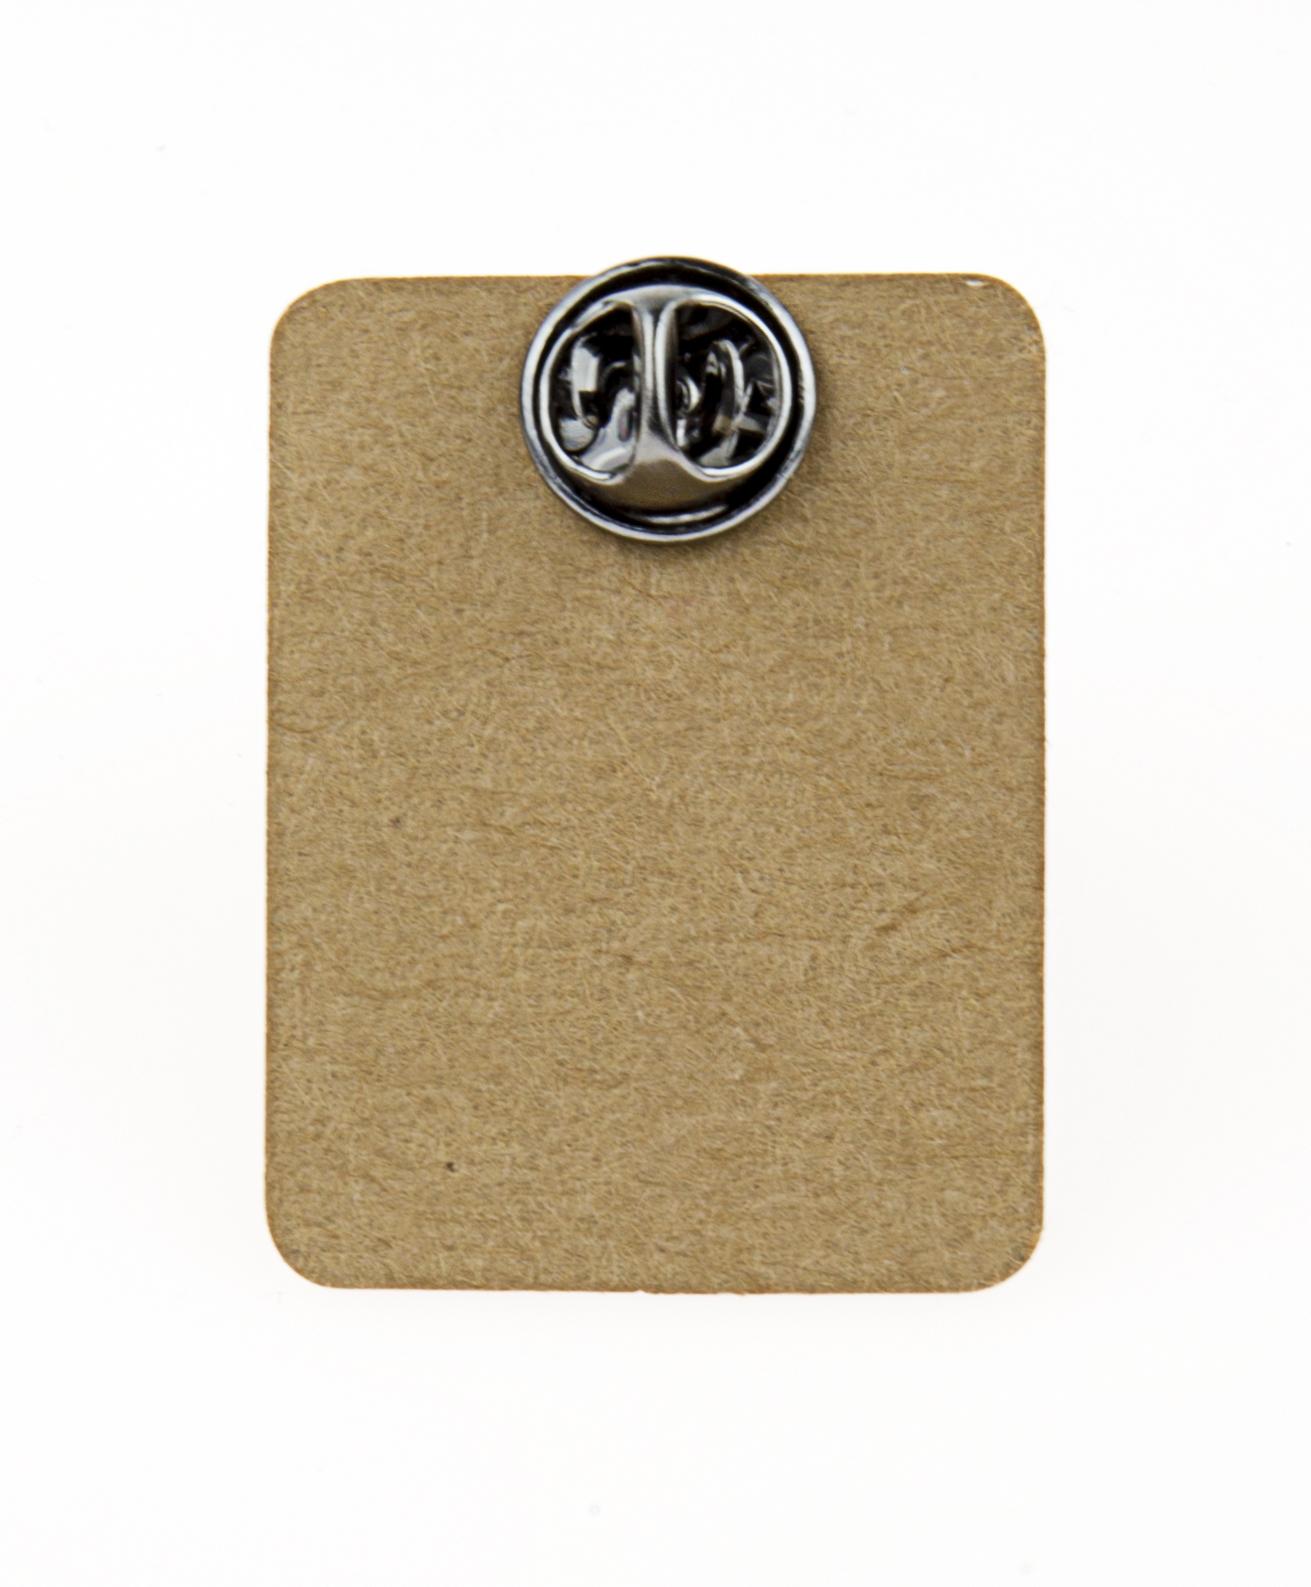 Metal Alien Head Enamel Pin Badge